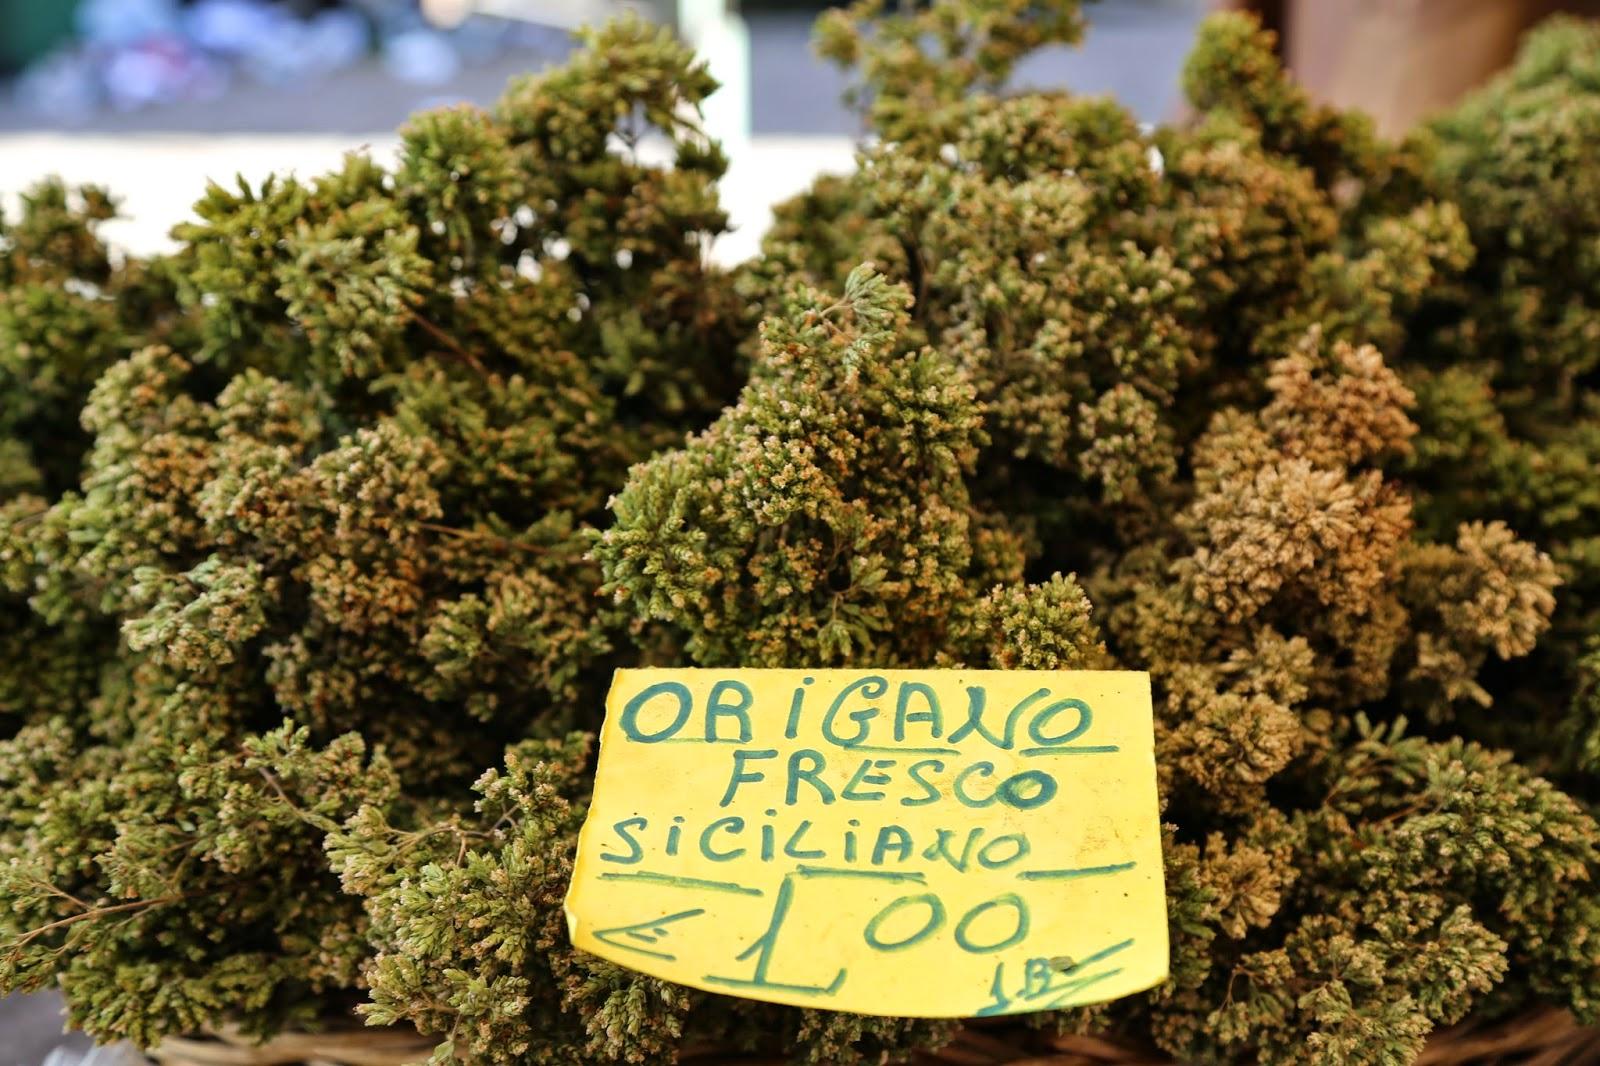 Fresh oregano, Palermo, Sicily